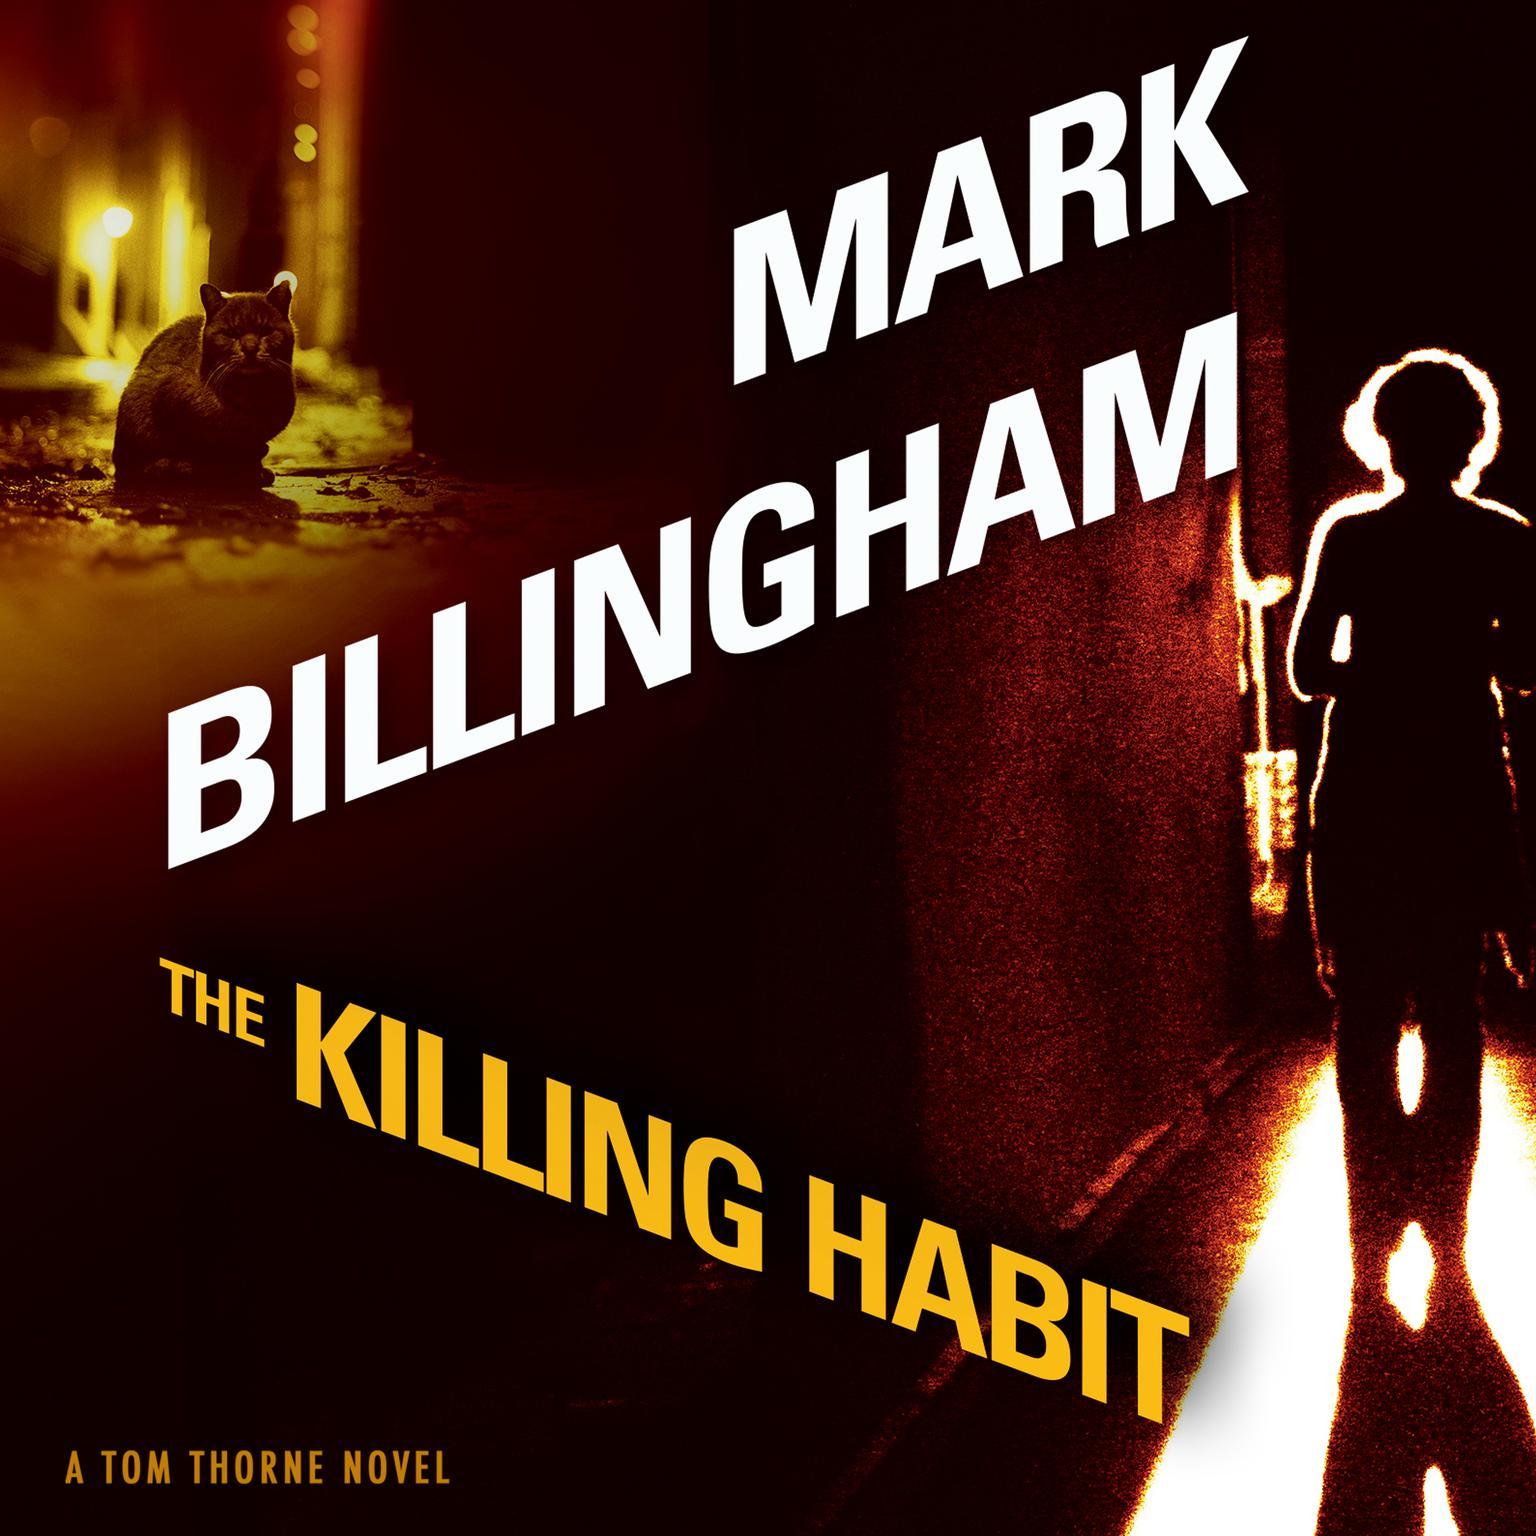 The Killing Habit Audiobook, by Mark Billingham